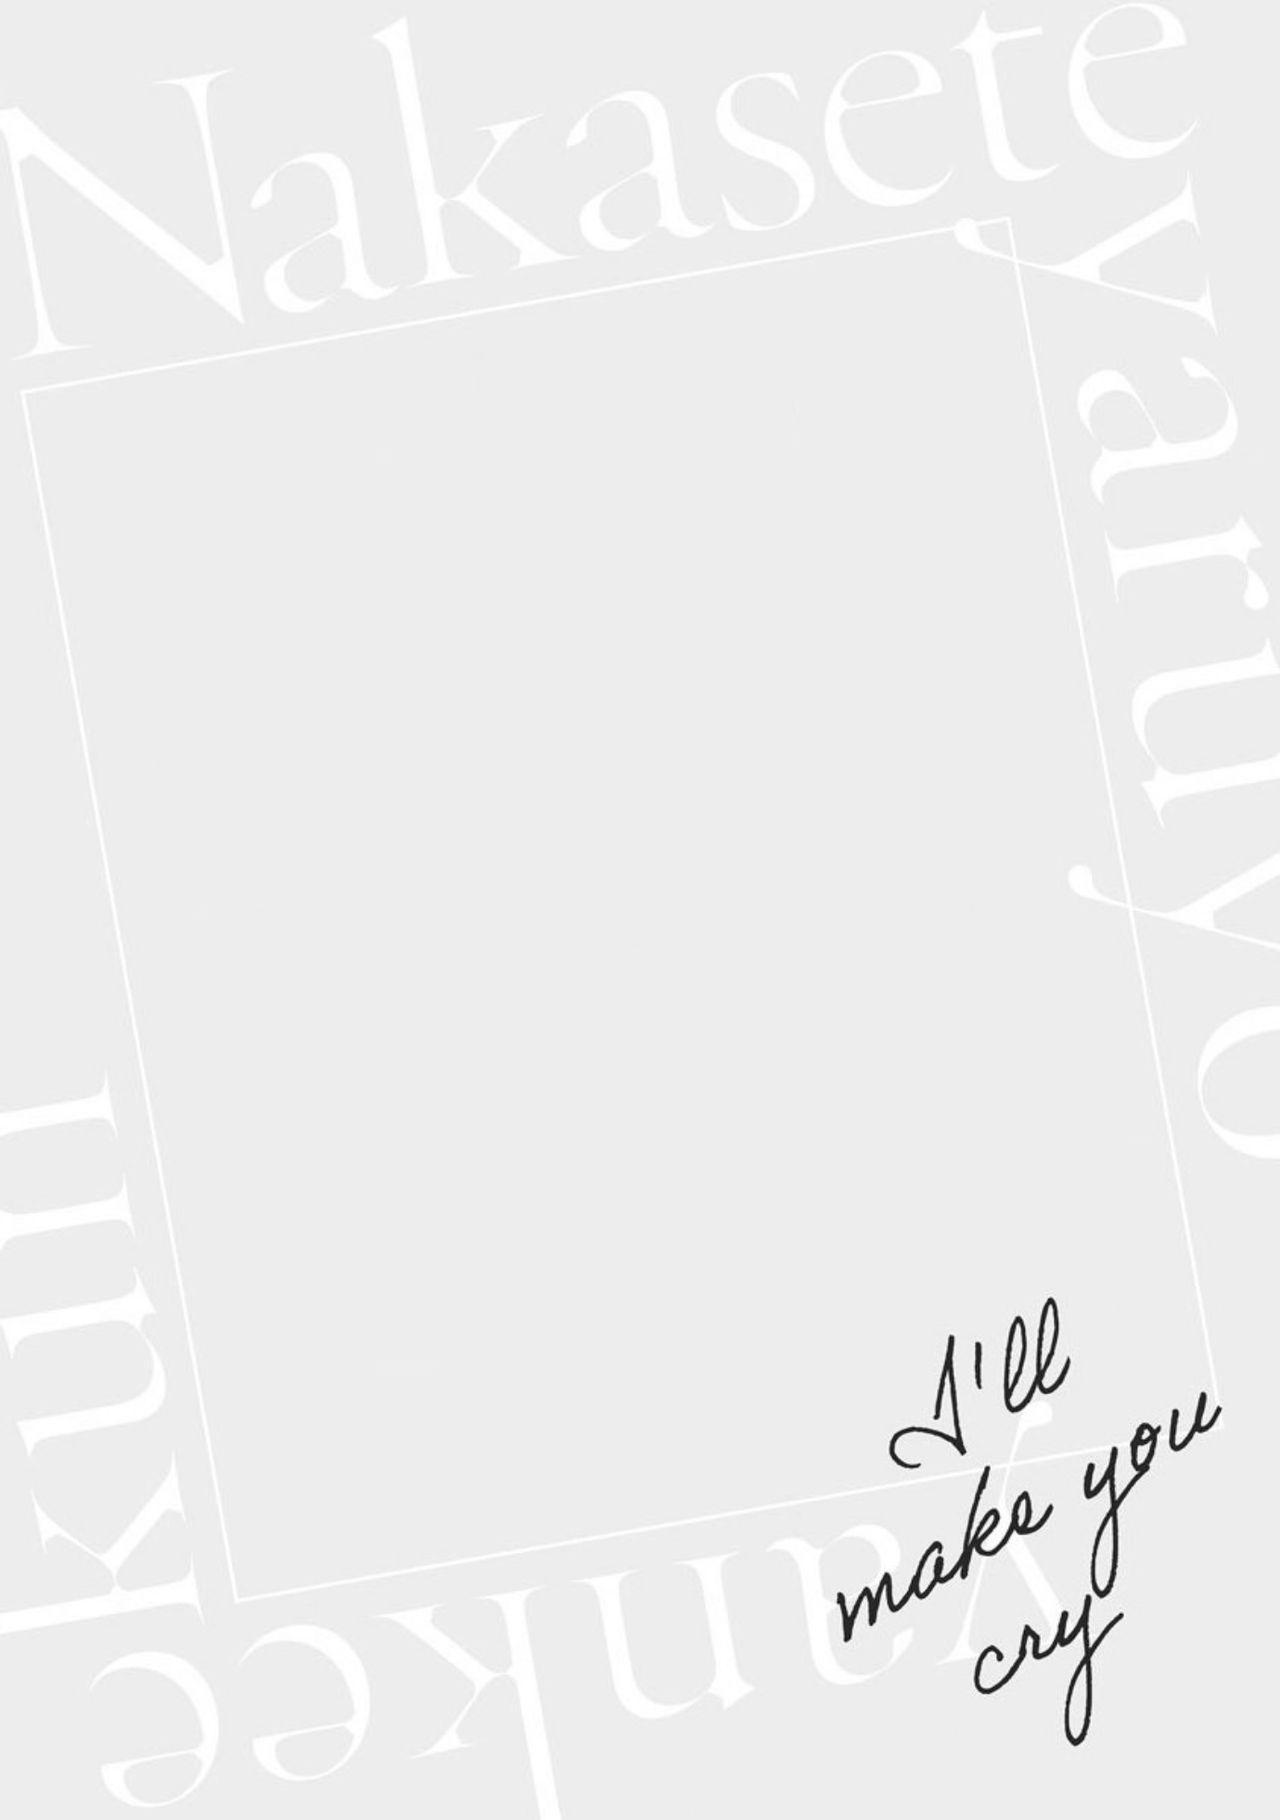 [Hiiragi Nozomu] Nakasete Yaru yo Yankee-kun   I'll Make You Cry Ch. 1-5 + Extras [English] [Digital] 120